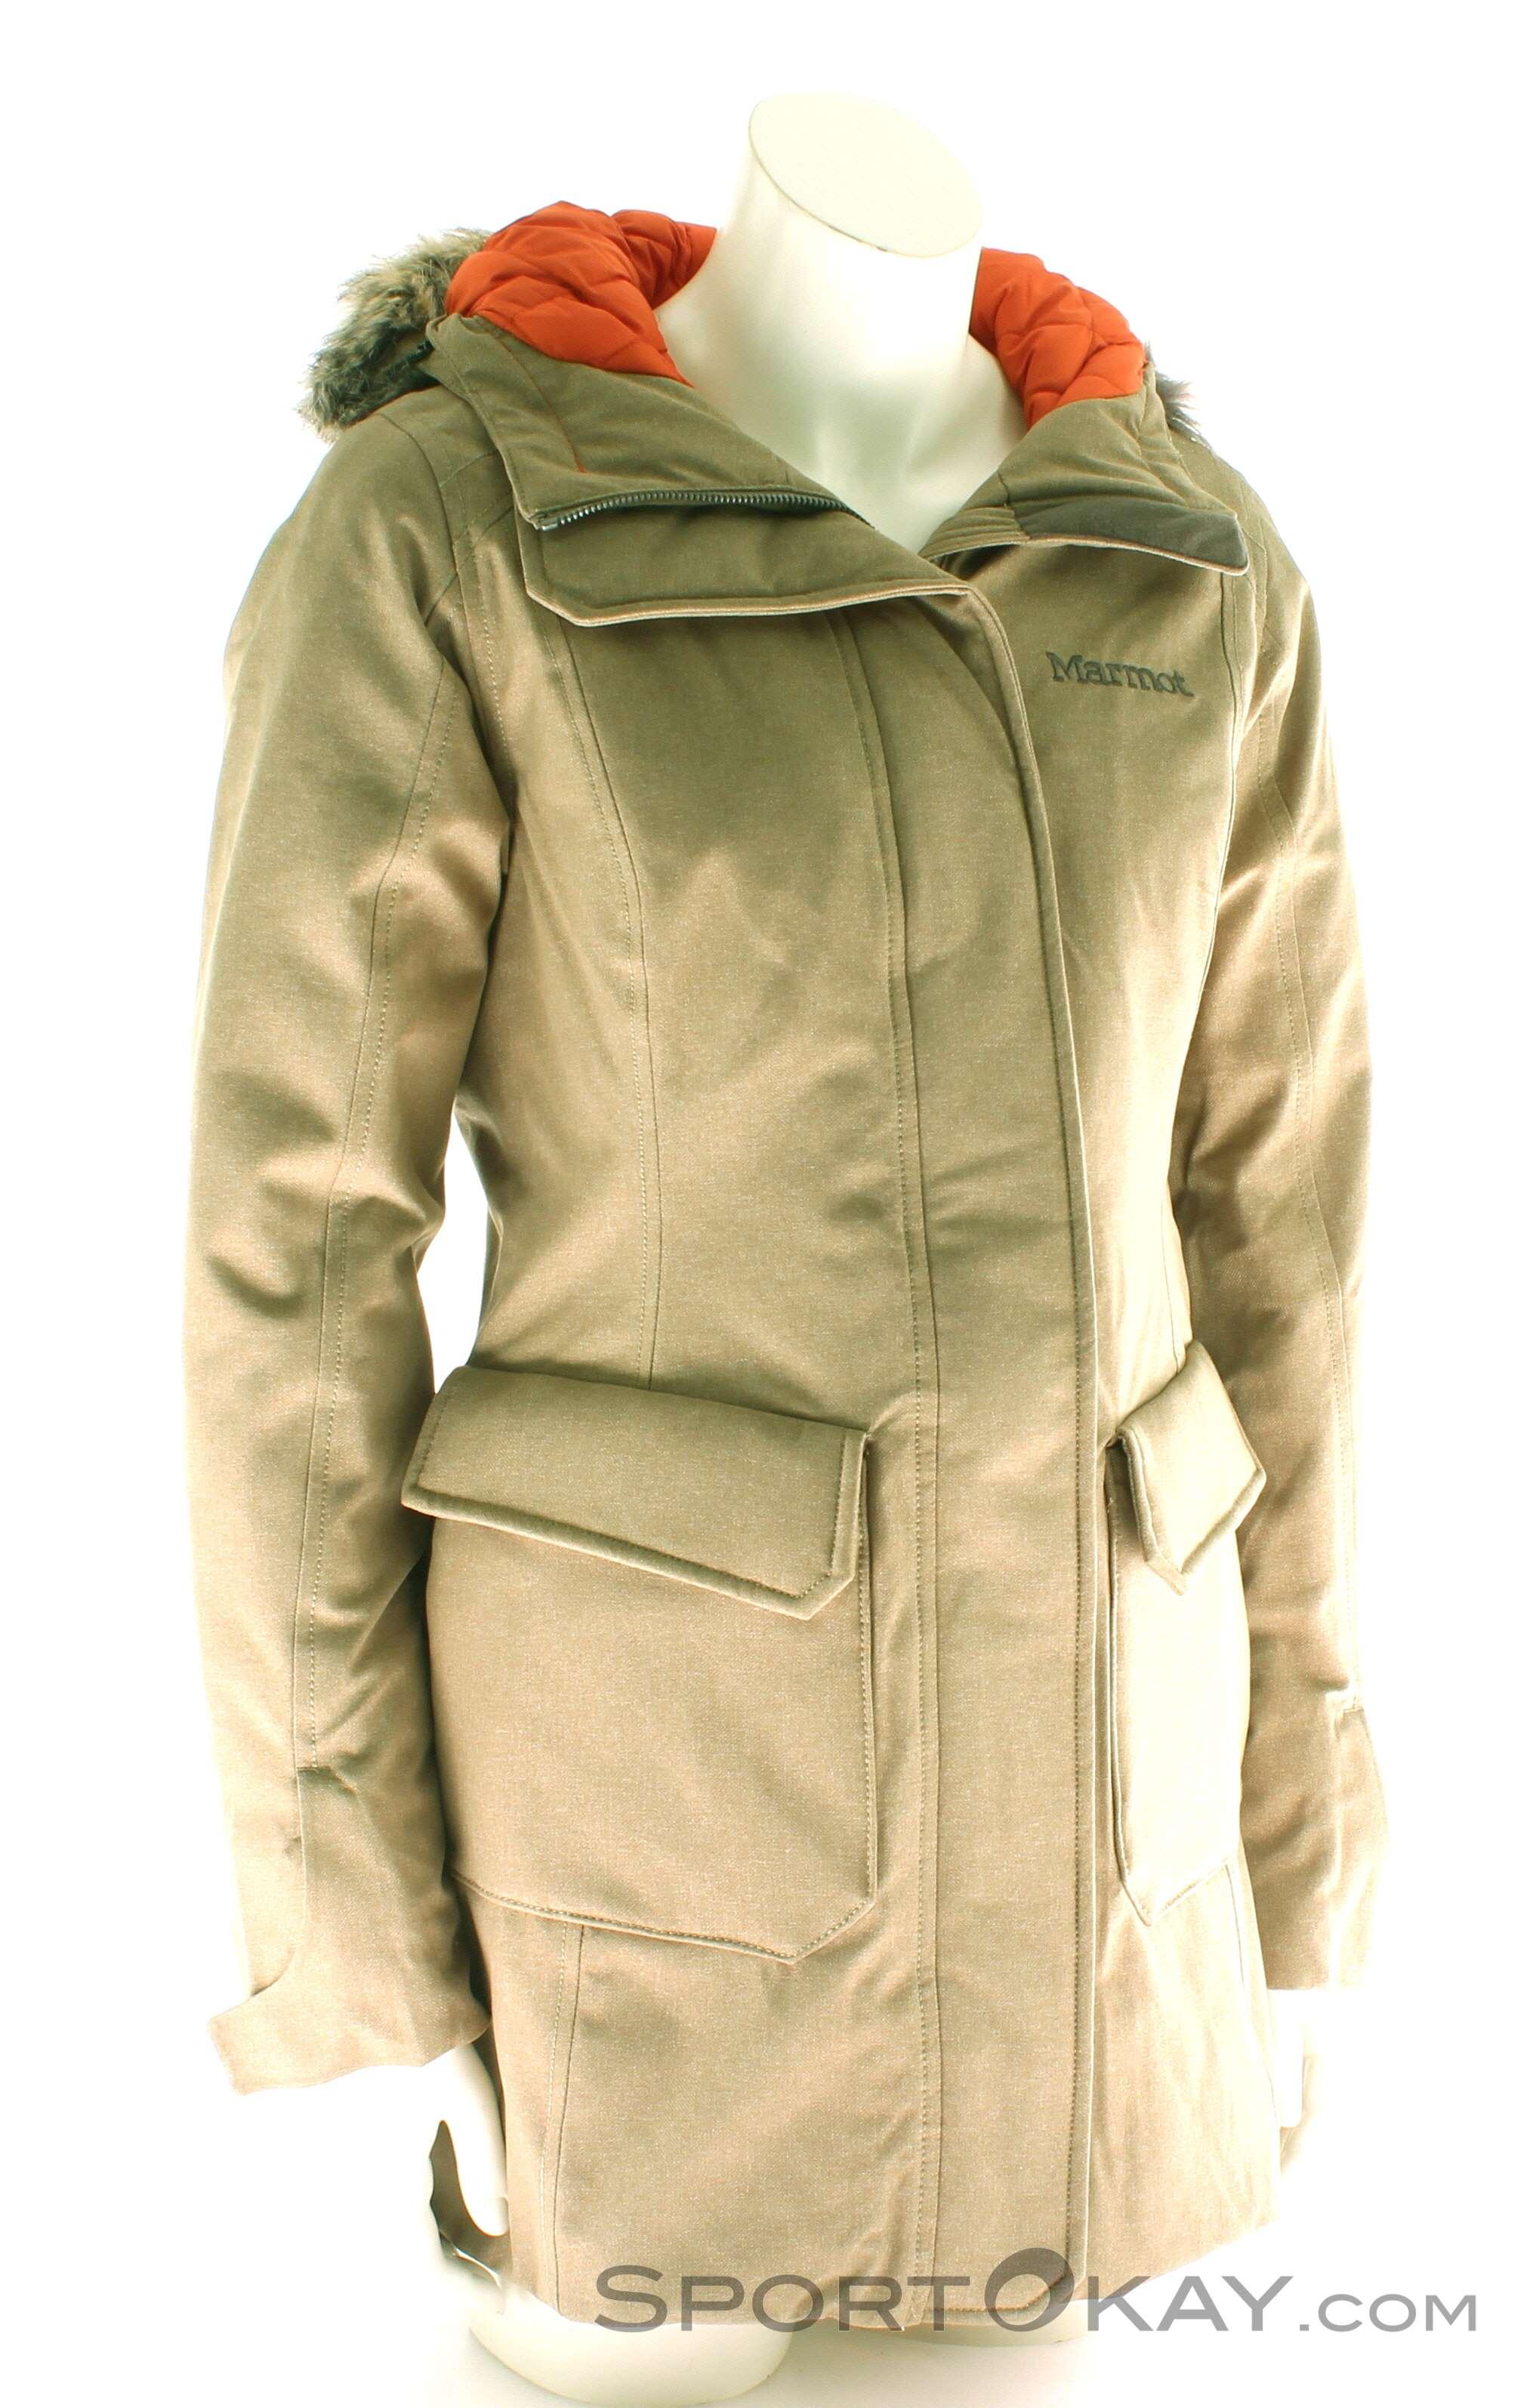 Marmot Georgina Featherless Jacket Womens Outdoor Jacket - Jackets ... 9cc886a1e0ef